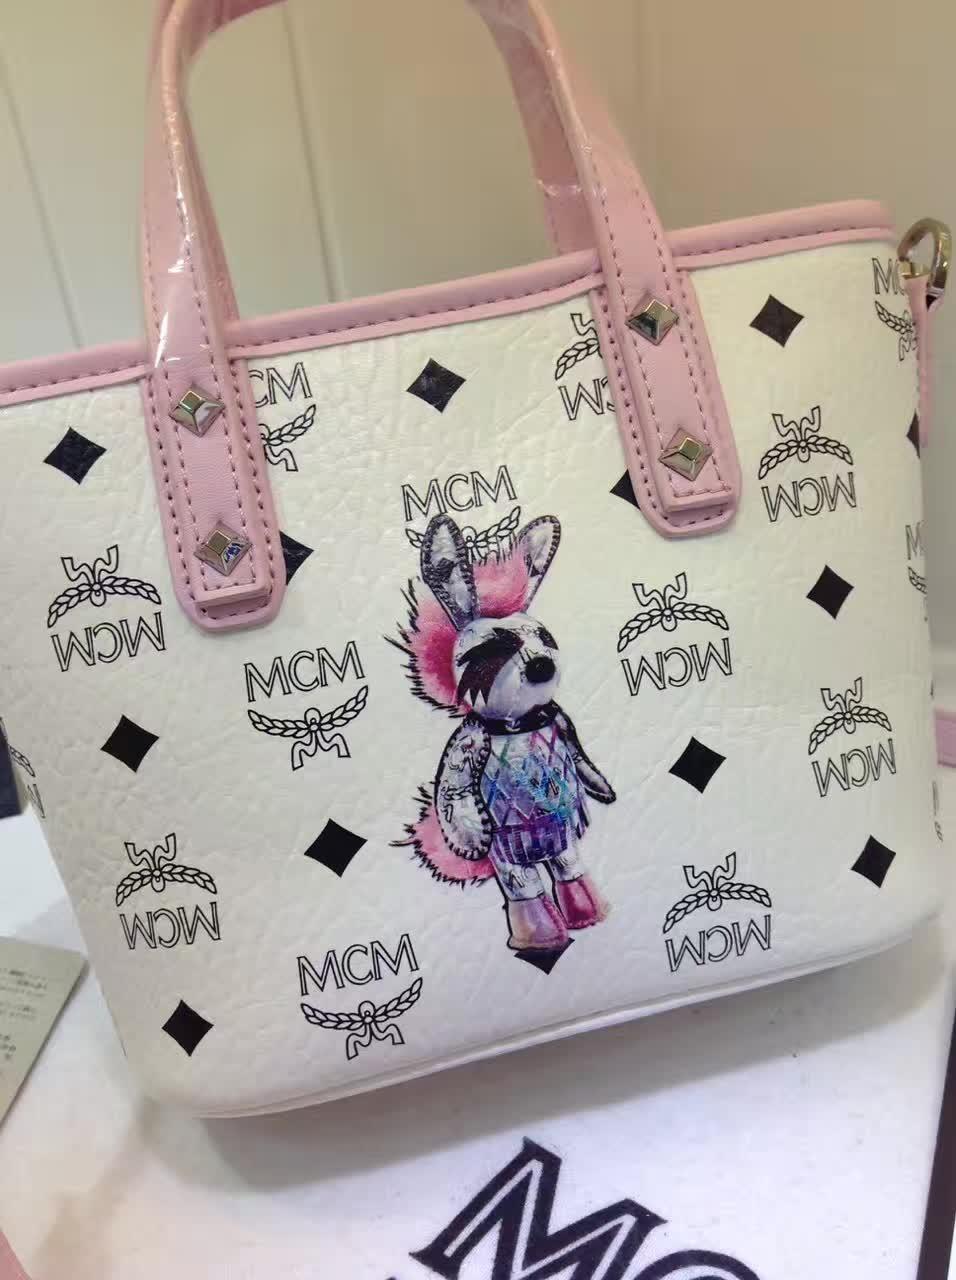 MCM包包批发 2017专柜新款 兔子购物袋造型mini斜挎包 白拼粉